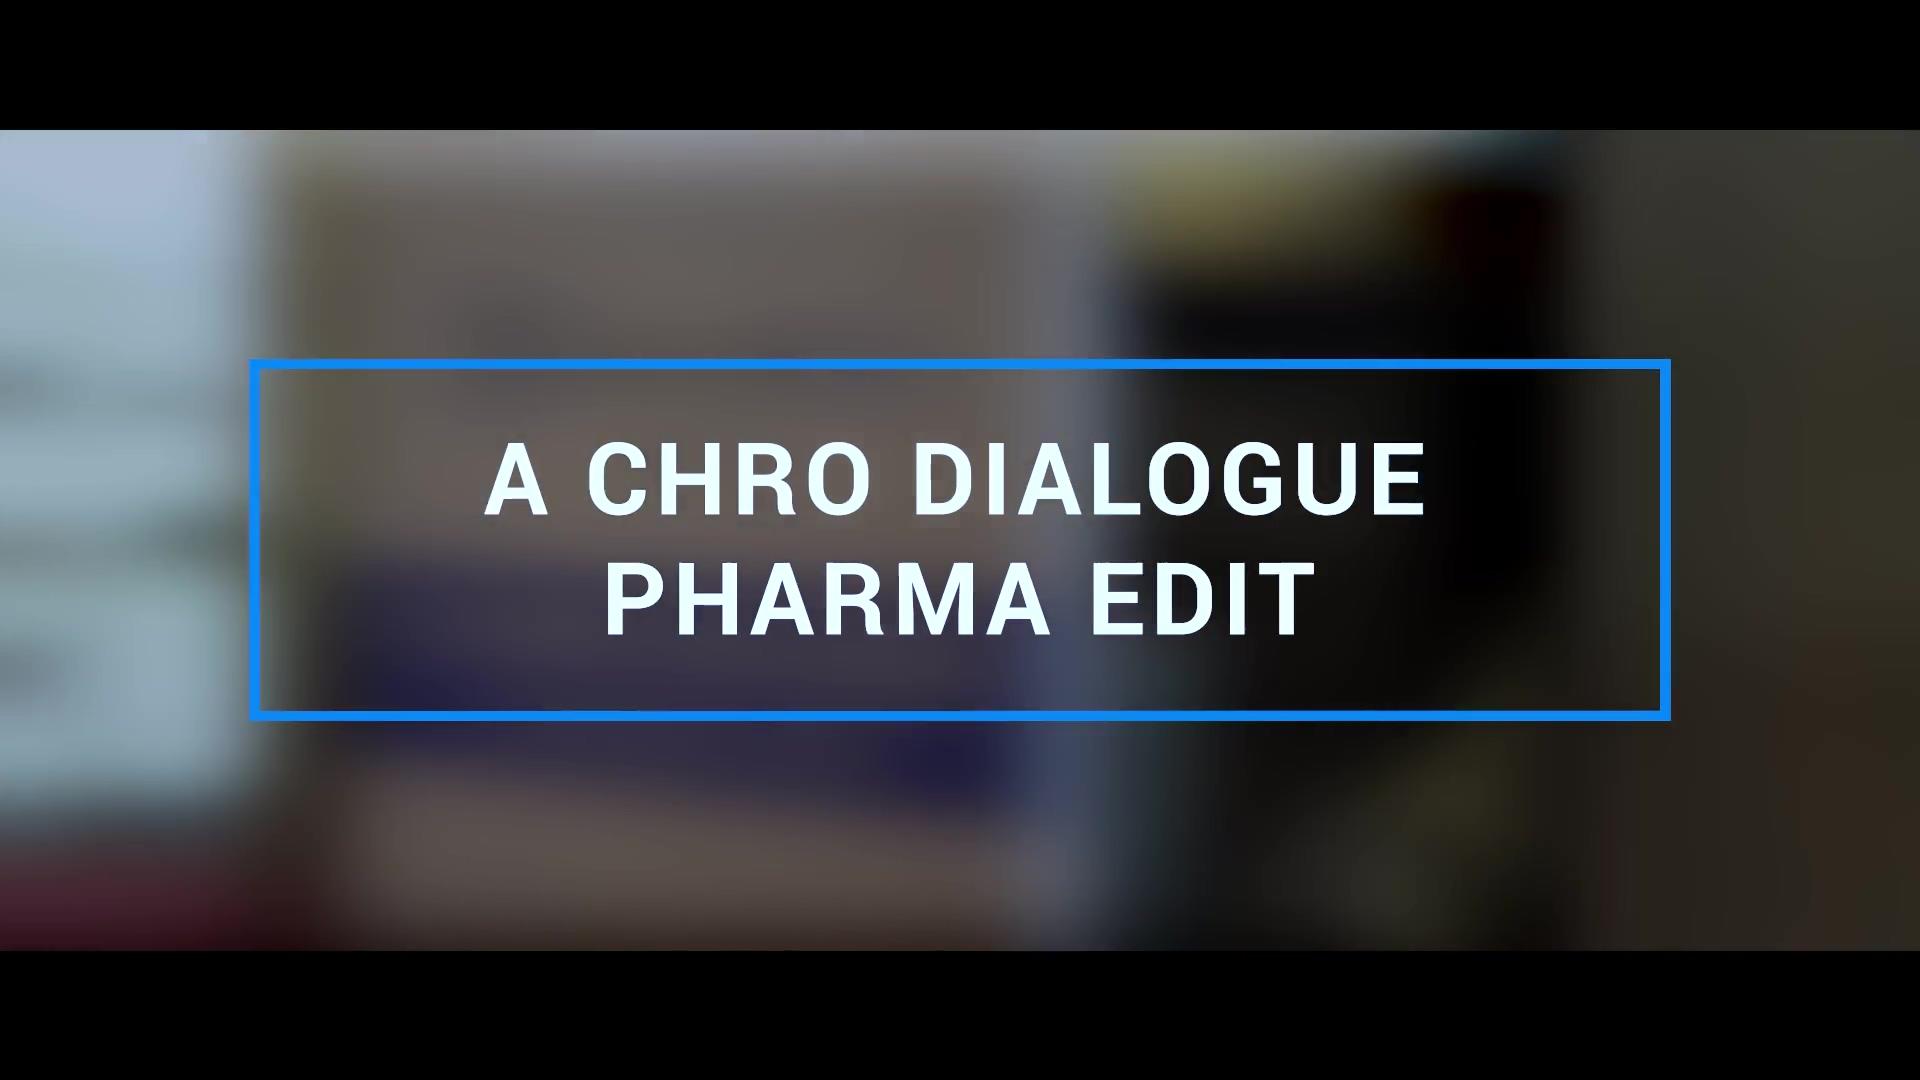 A CHRO Dialogue - Pharma Edit_Darwinbox